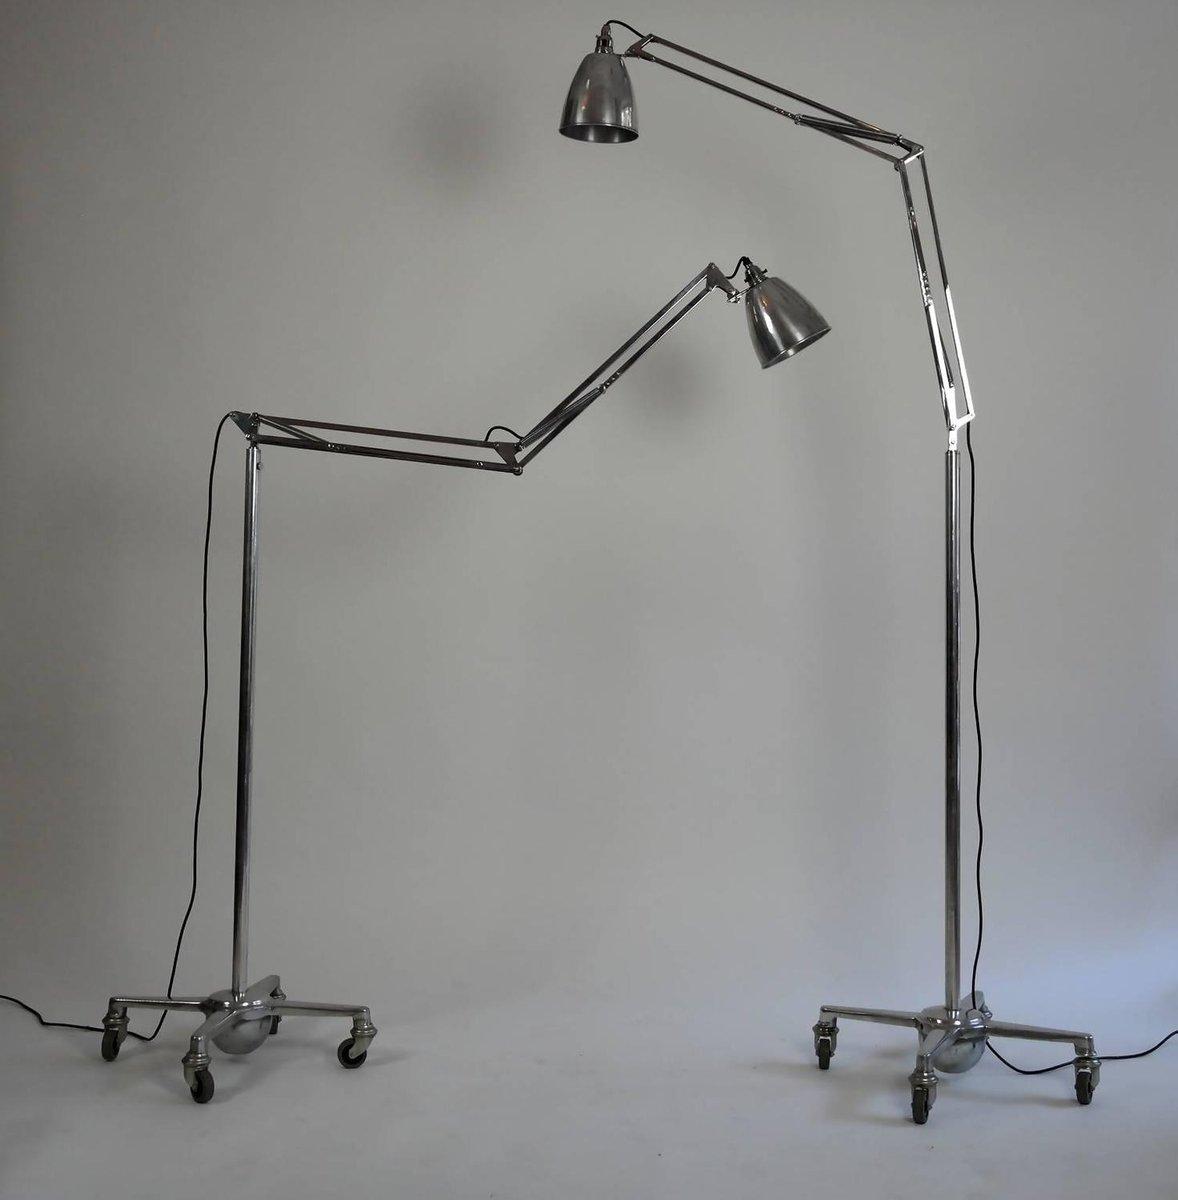 anglepoise floor lamp by george carwardine for herbert. Black Bedroom Furniture Sets. Home Design Ideas